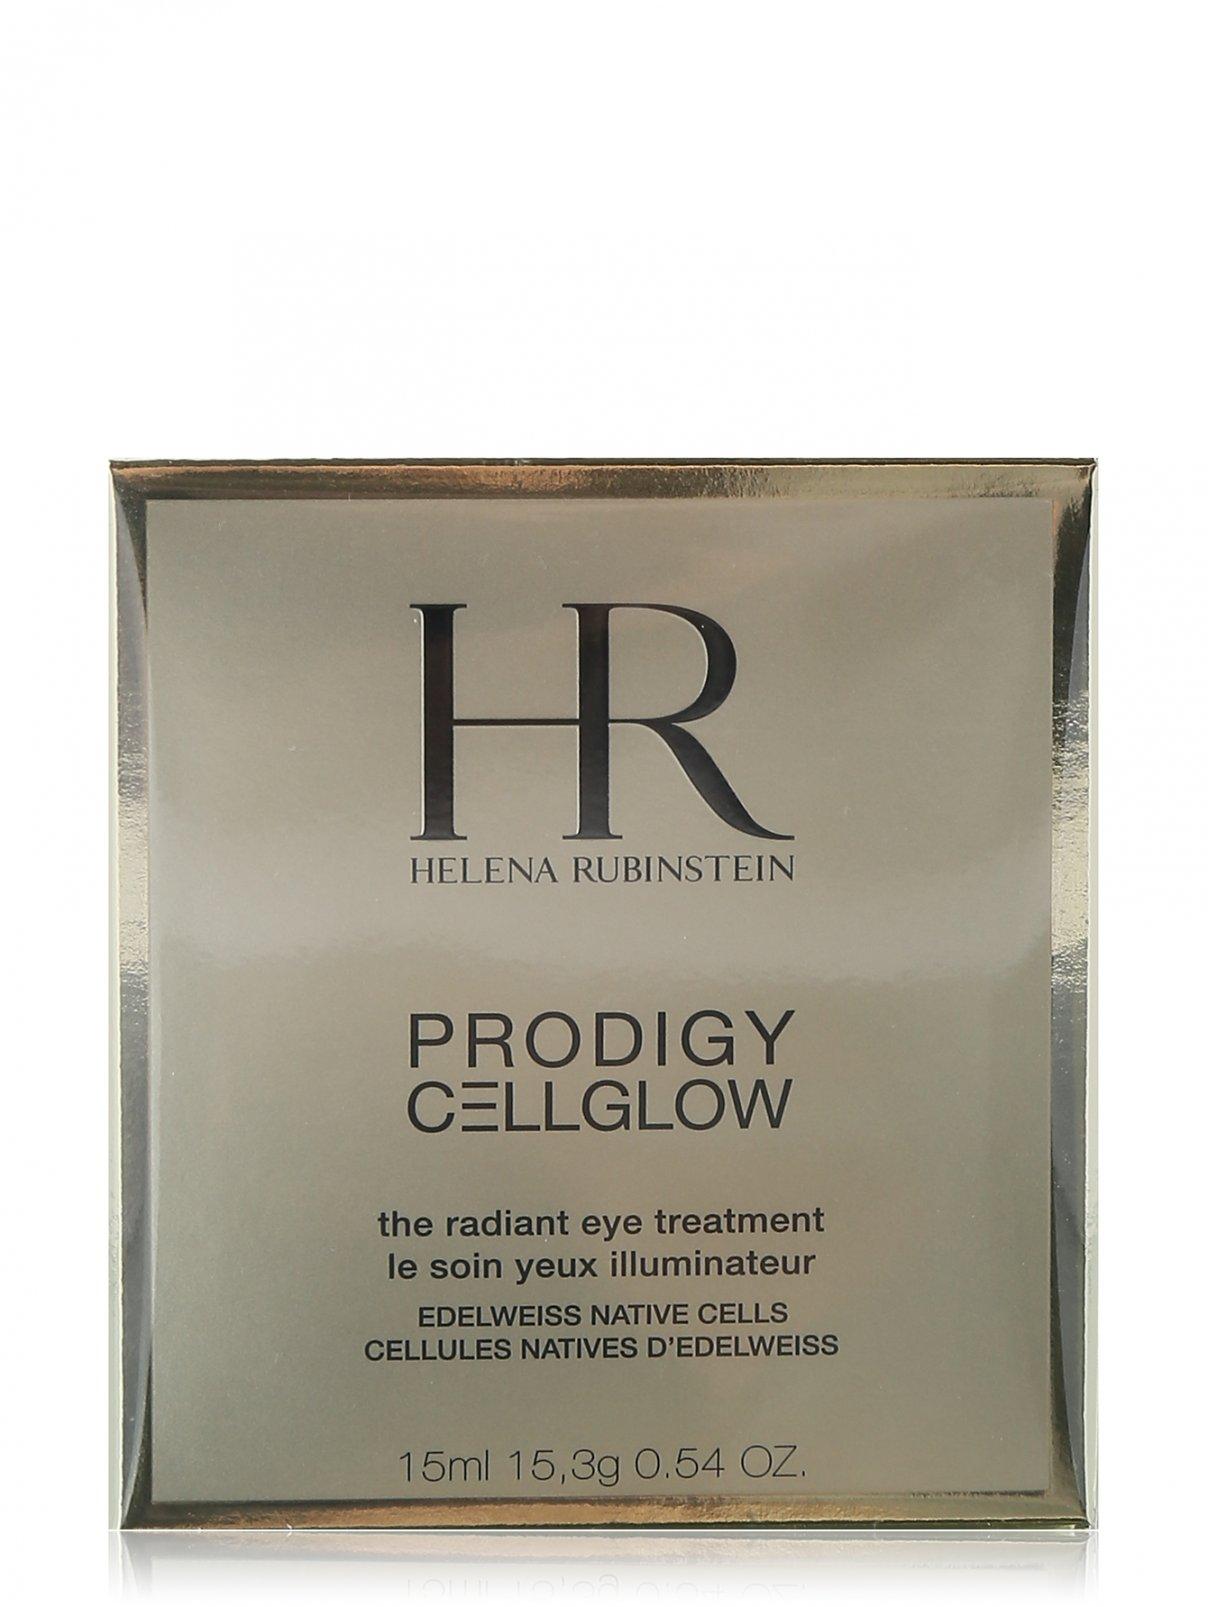 Крем для глаз 15 мл Prodigy Cellglow Helena Rubinstein  –  Общий вид